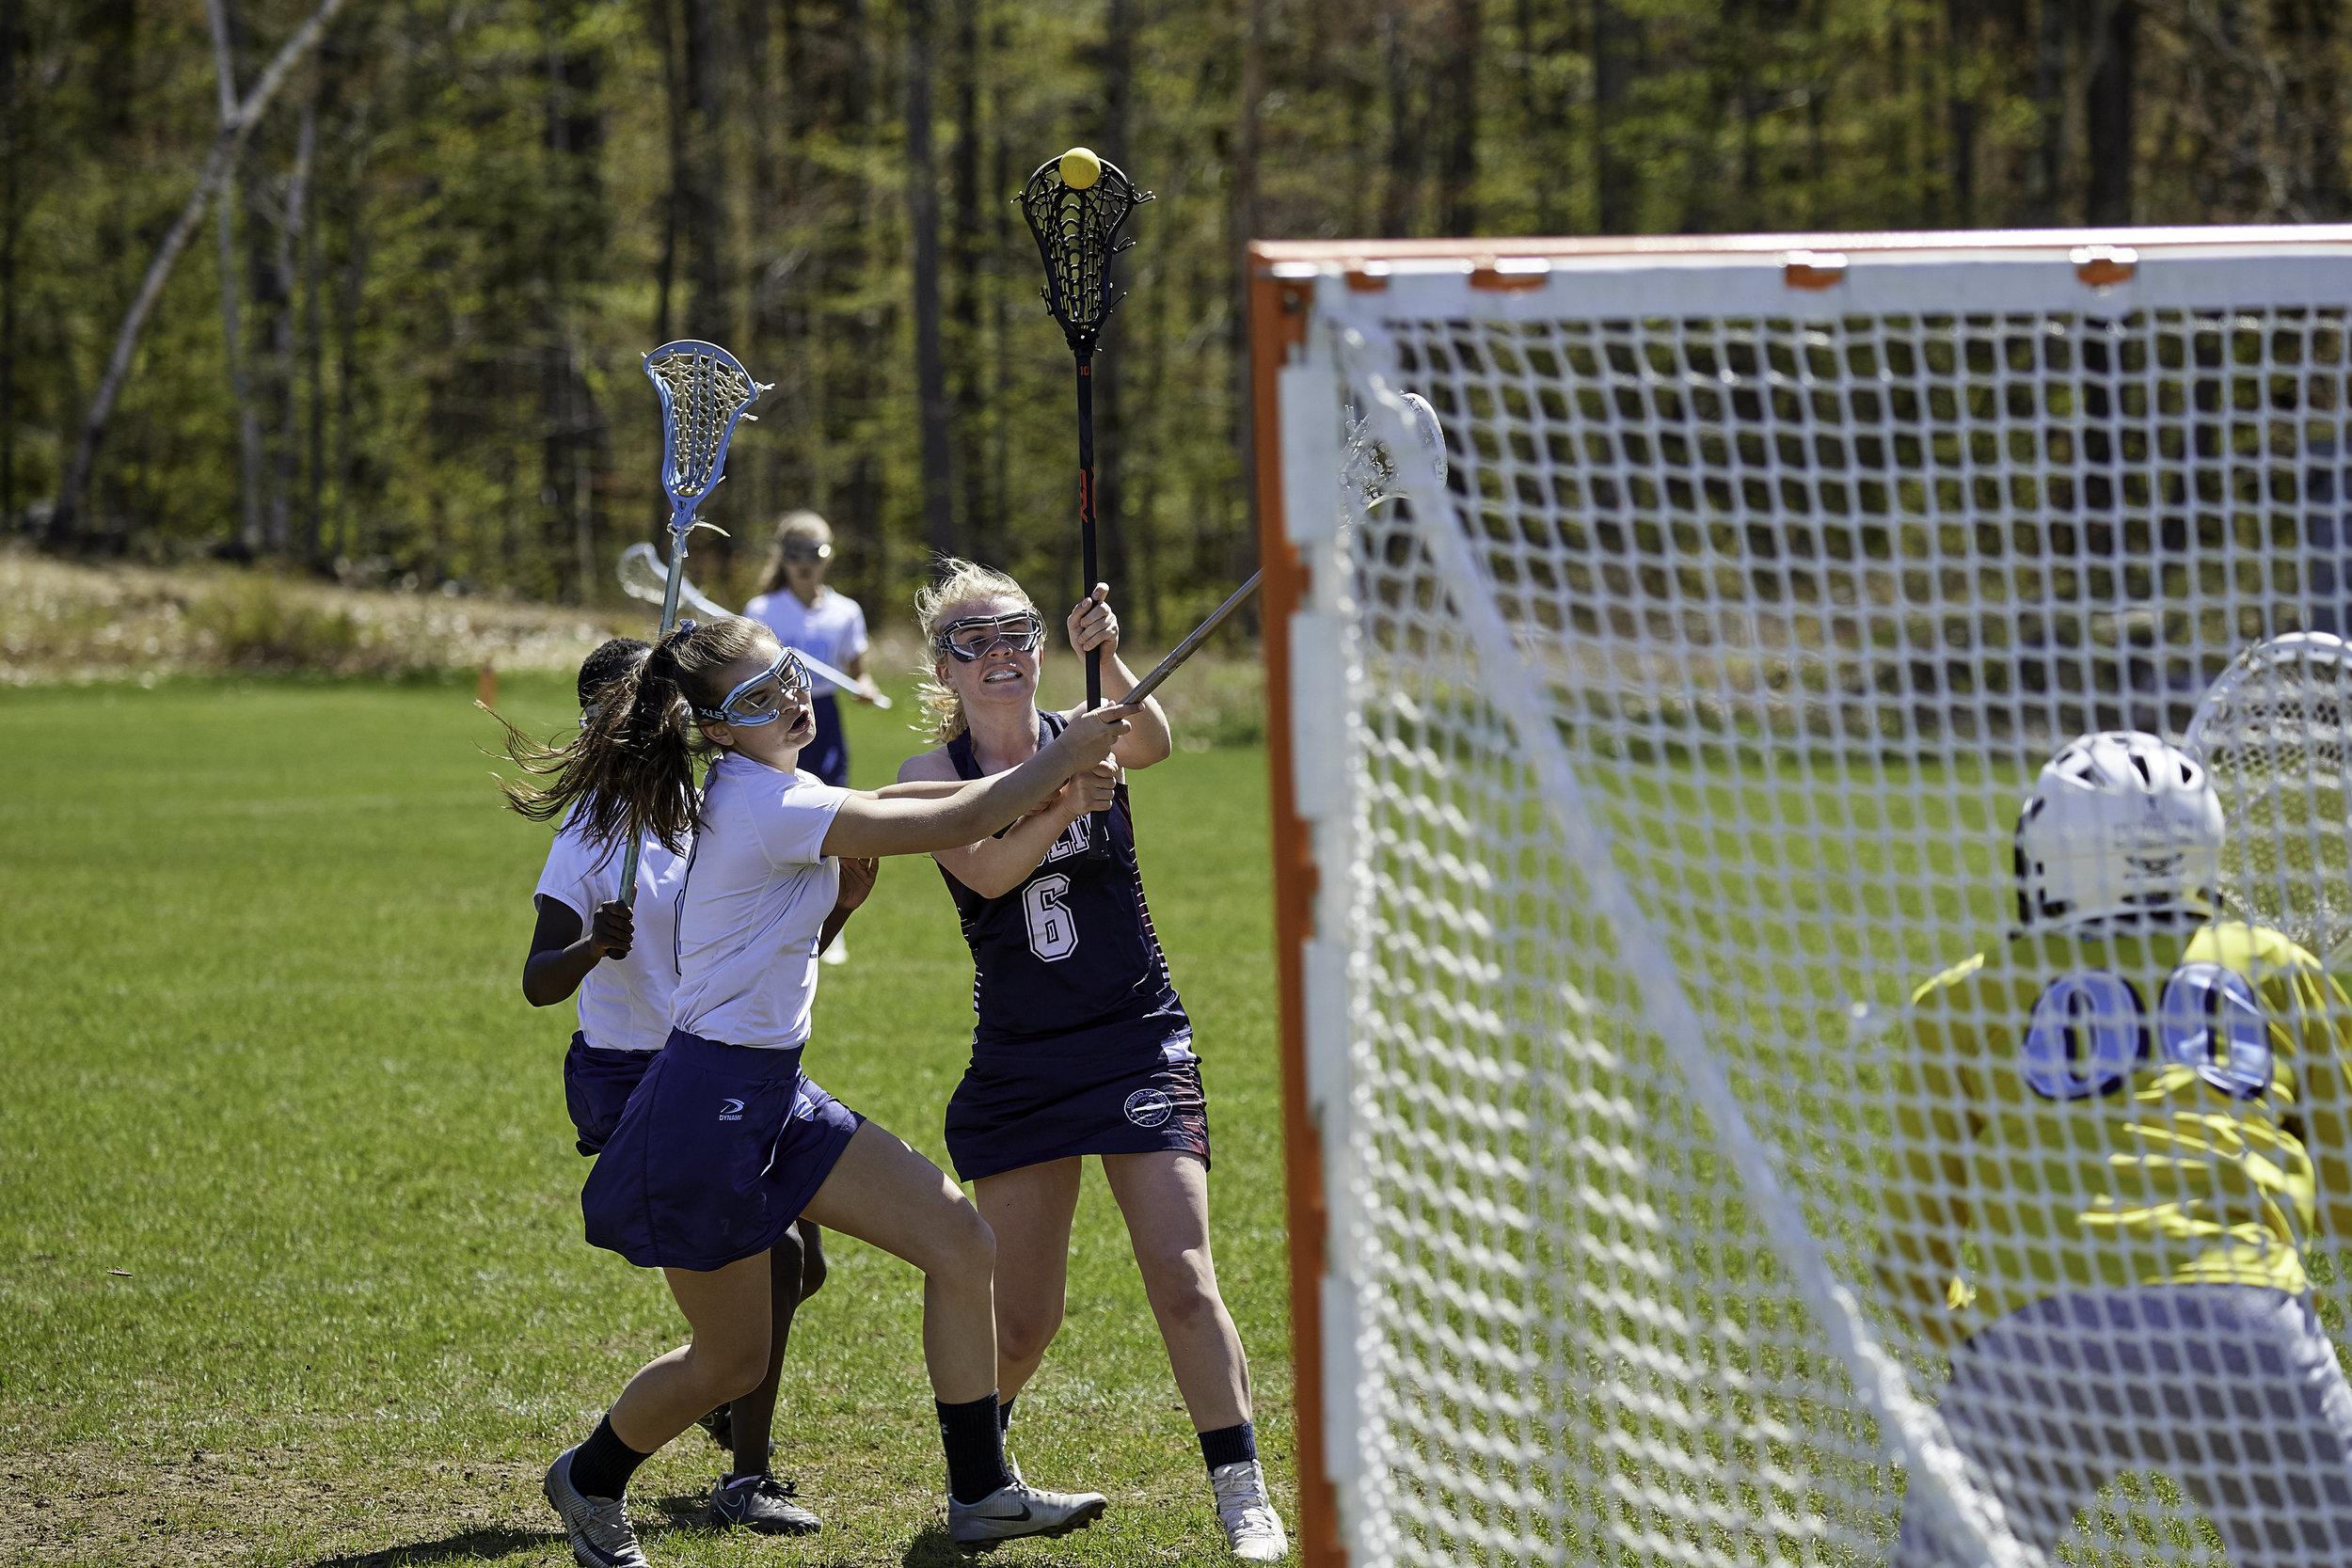 Girls Lacrosse vs. Stoneleigh Burnham School - May 11, 2019 - May 10, 2019193250.jpg